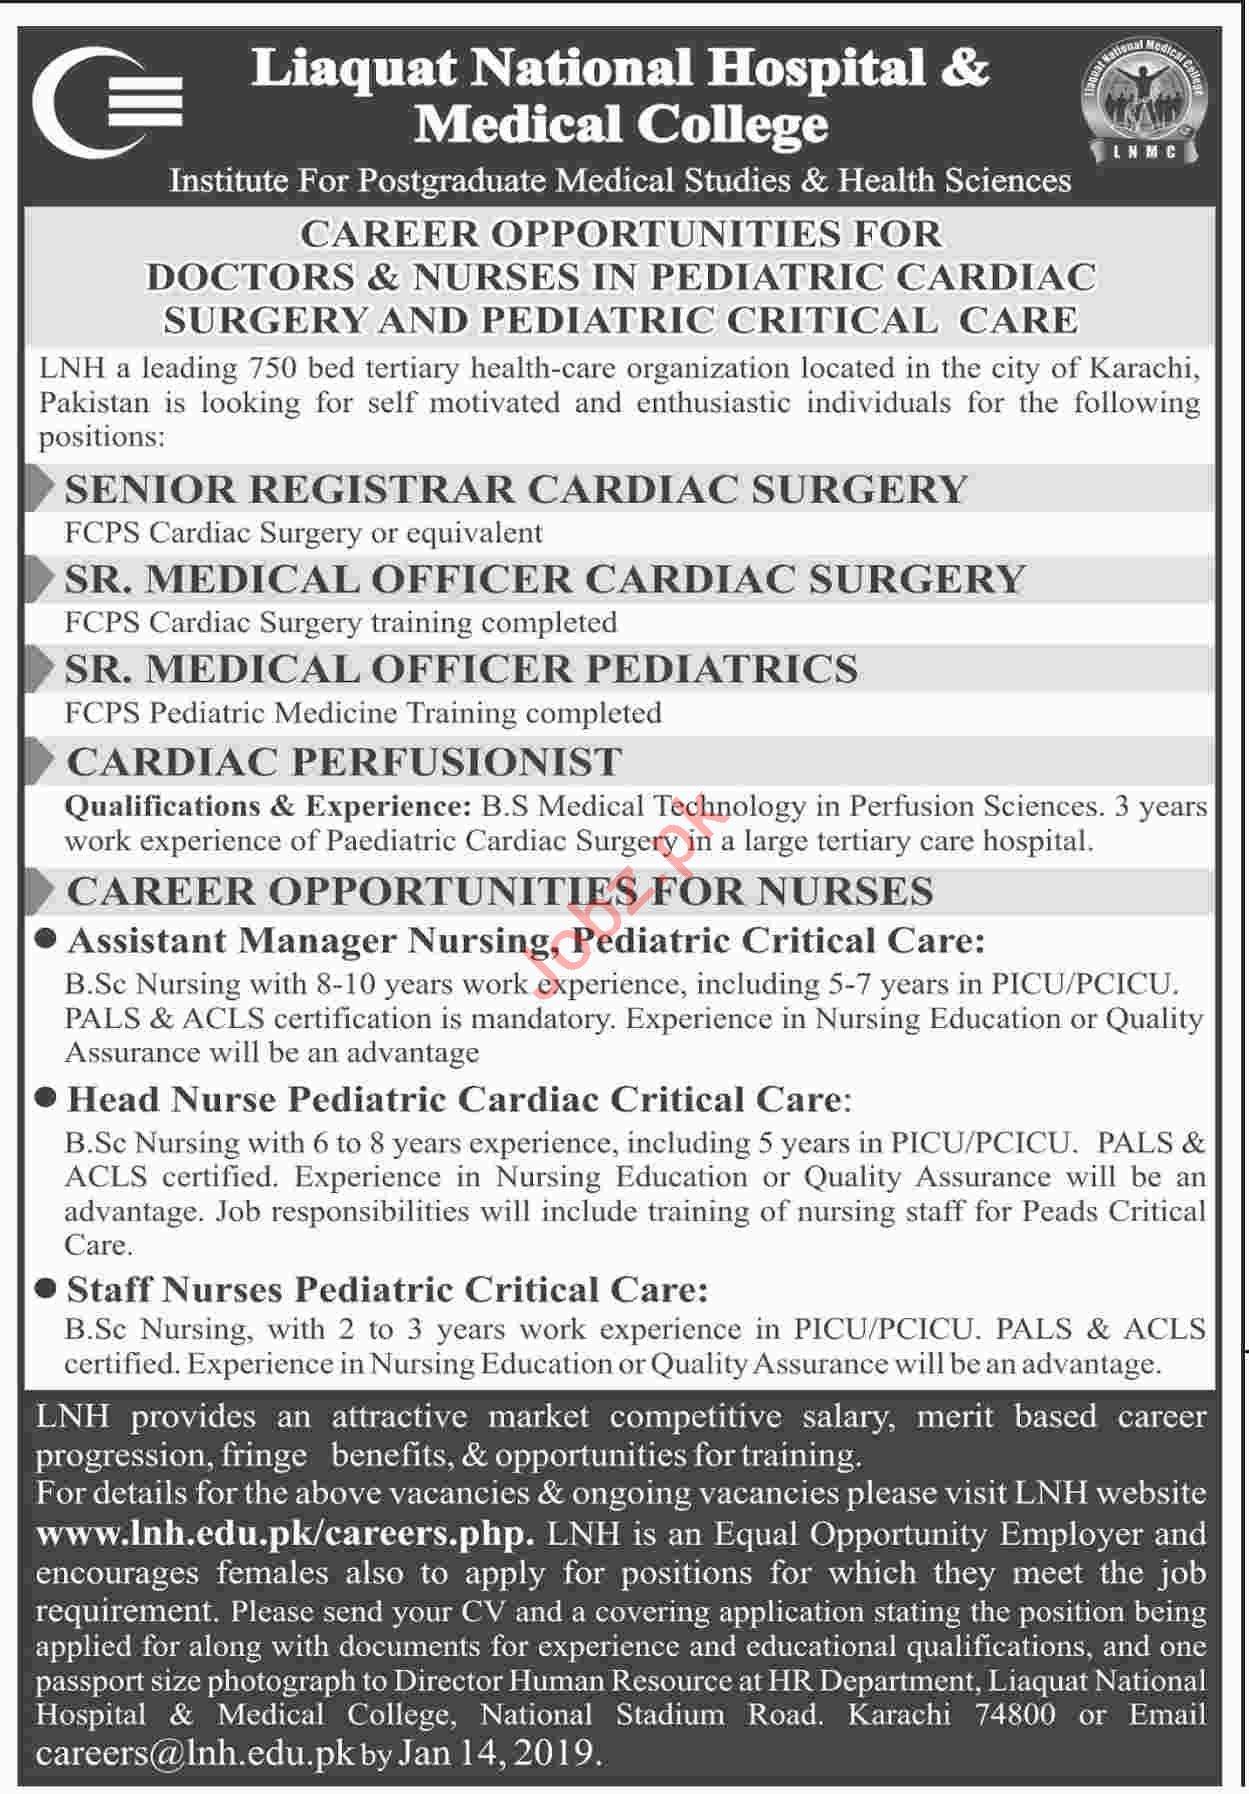 Senior Registrar Cardiac Surgery Jobs at LNH Medical College